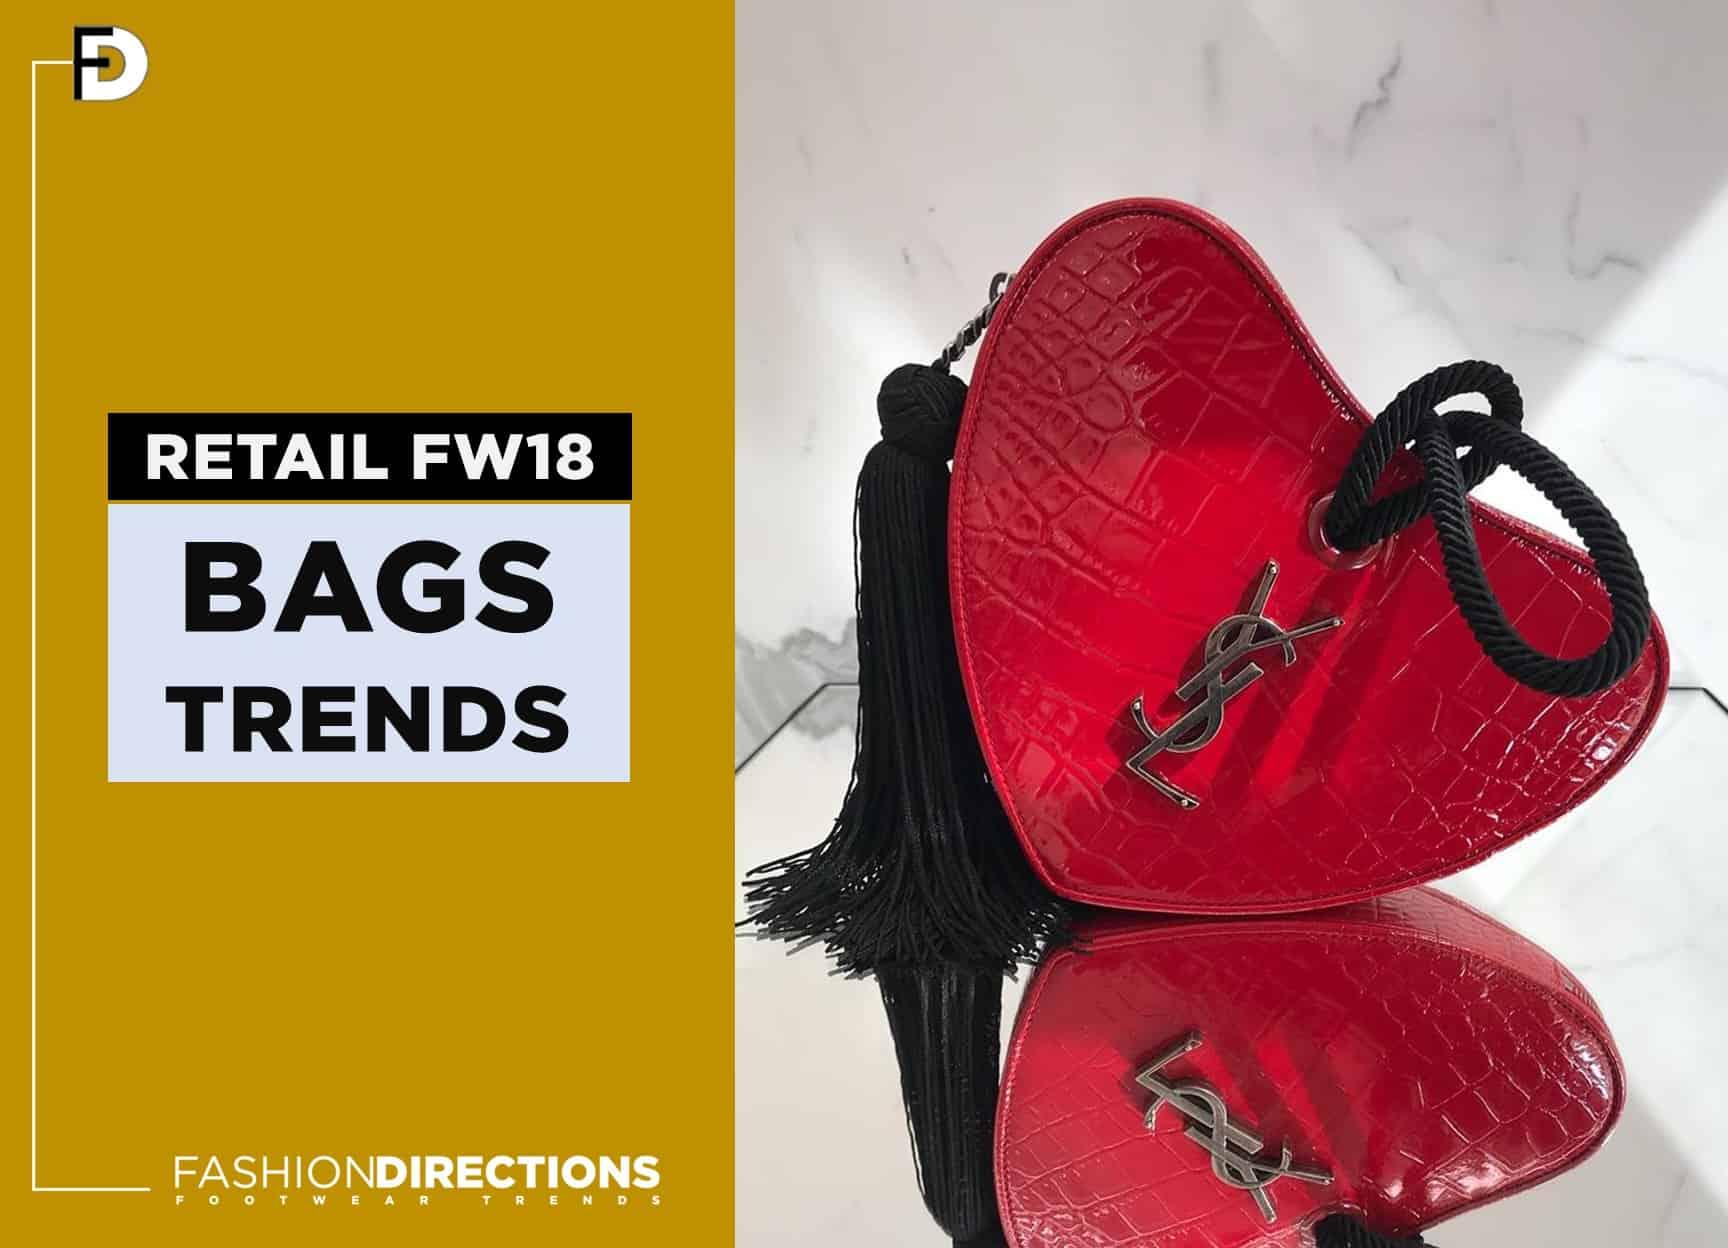 Retail Bags FW18/19